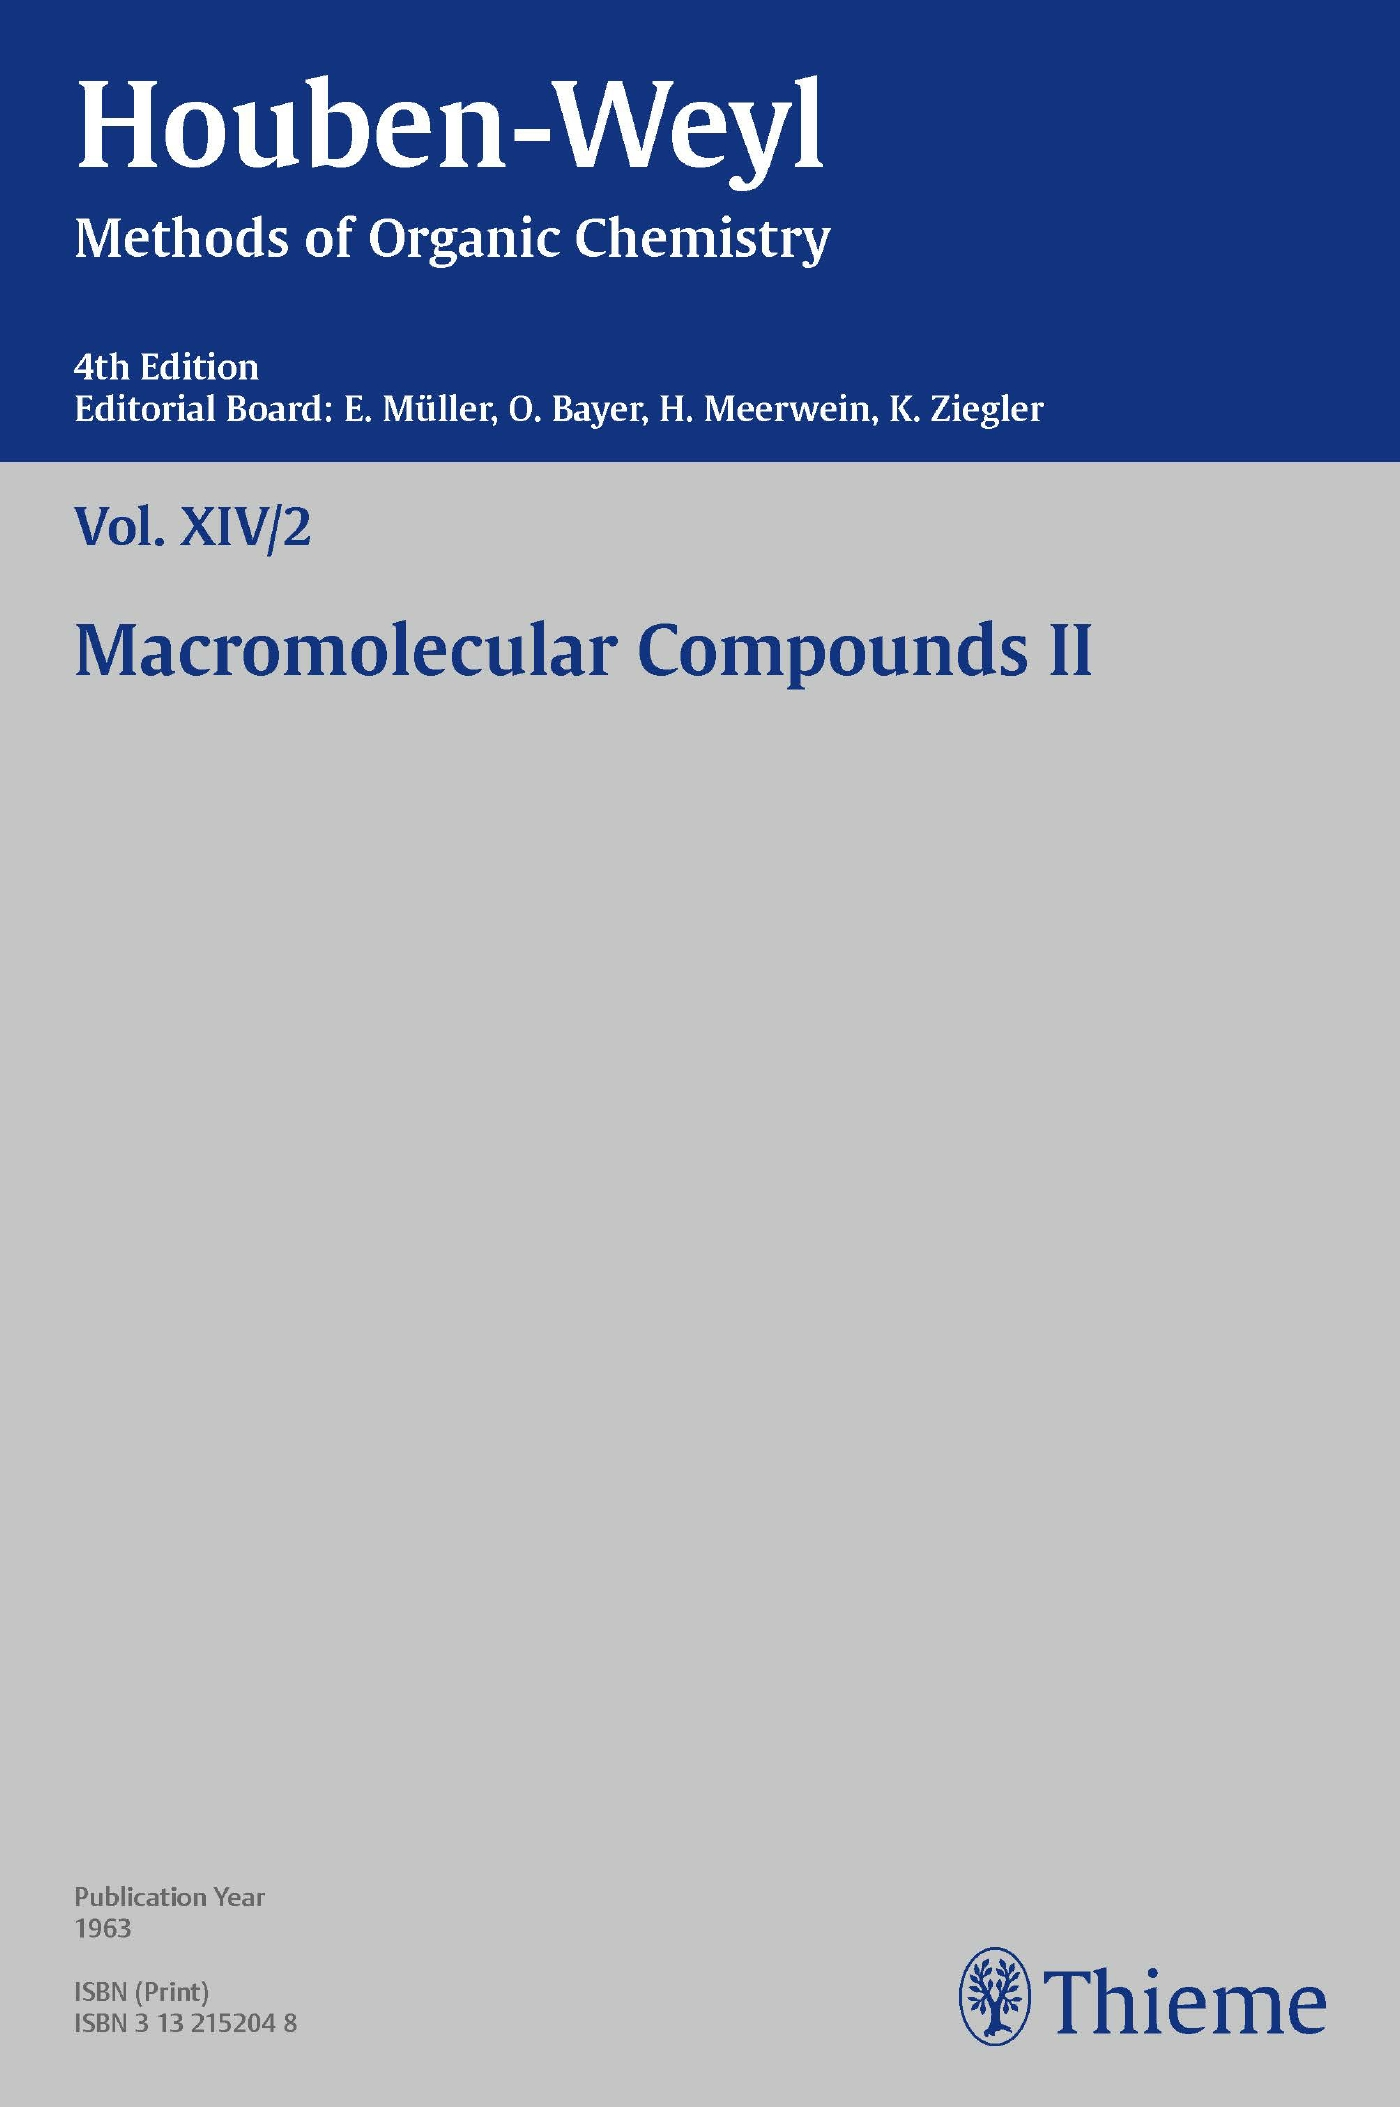 Houben-Weyl Methods of Organic Chemistry Vol. XIV/2, 4th Edition